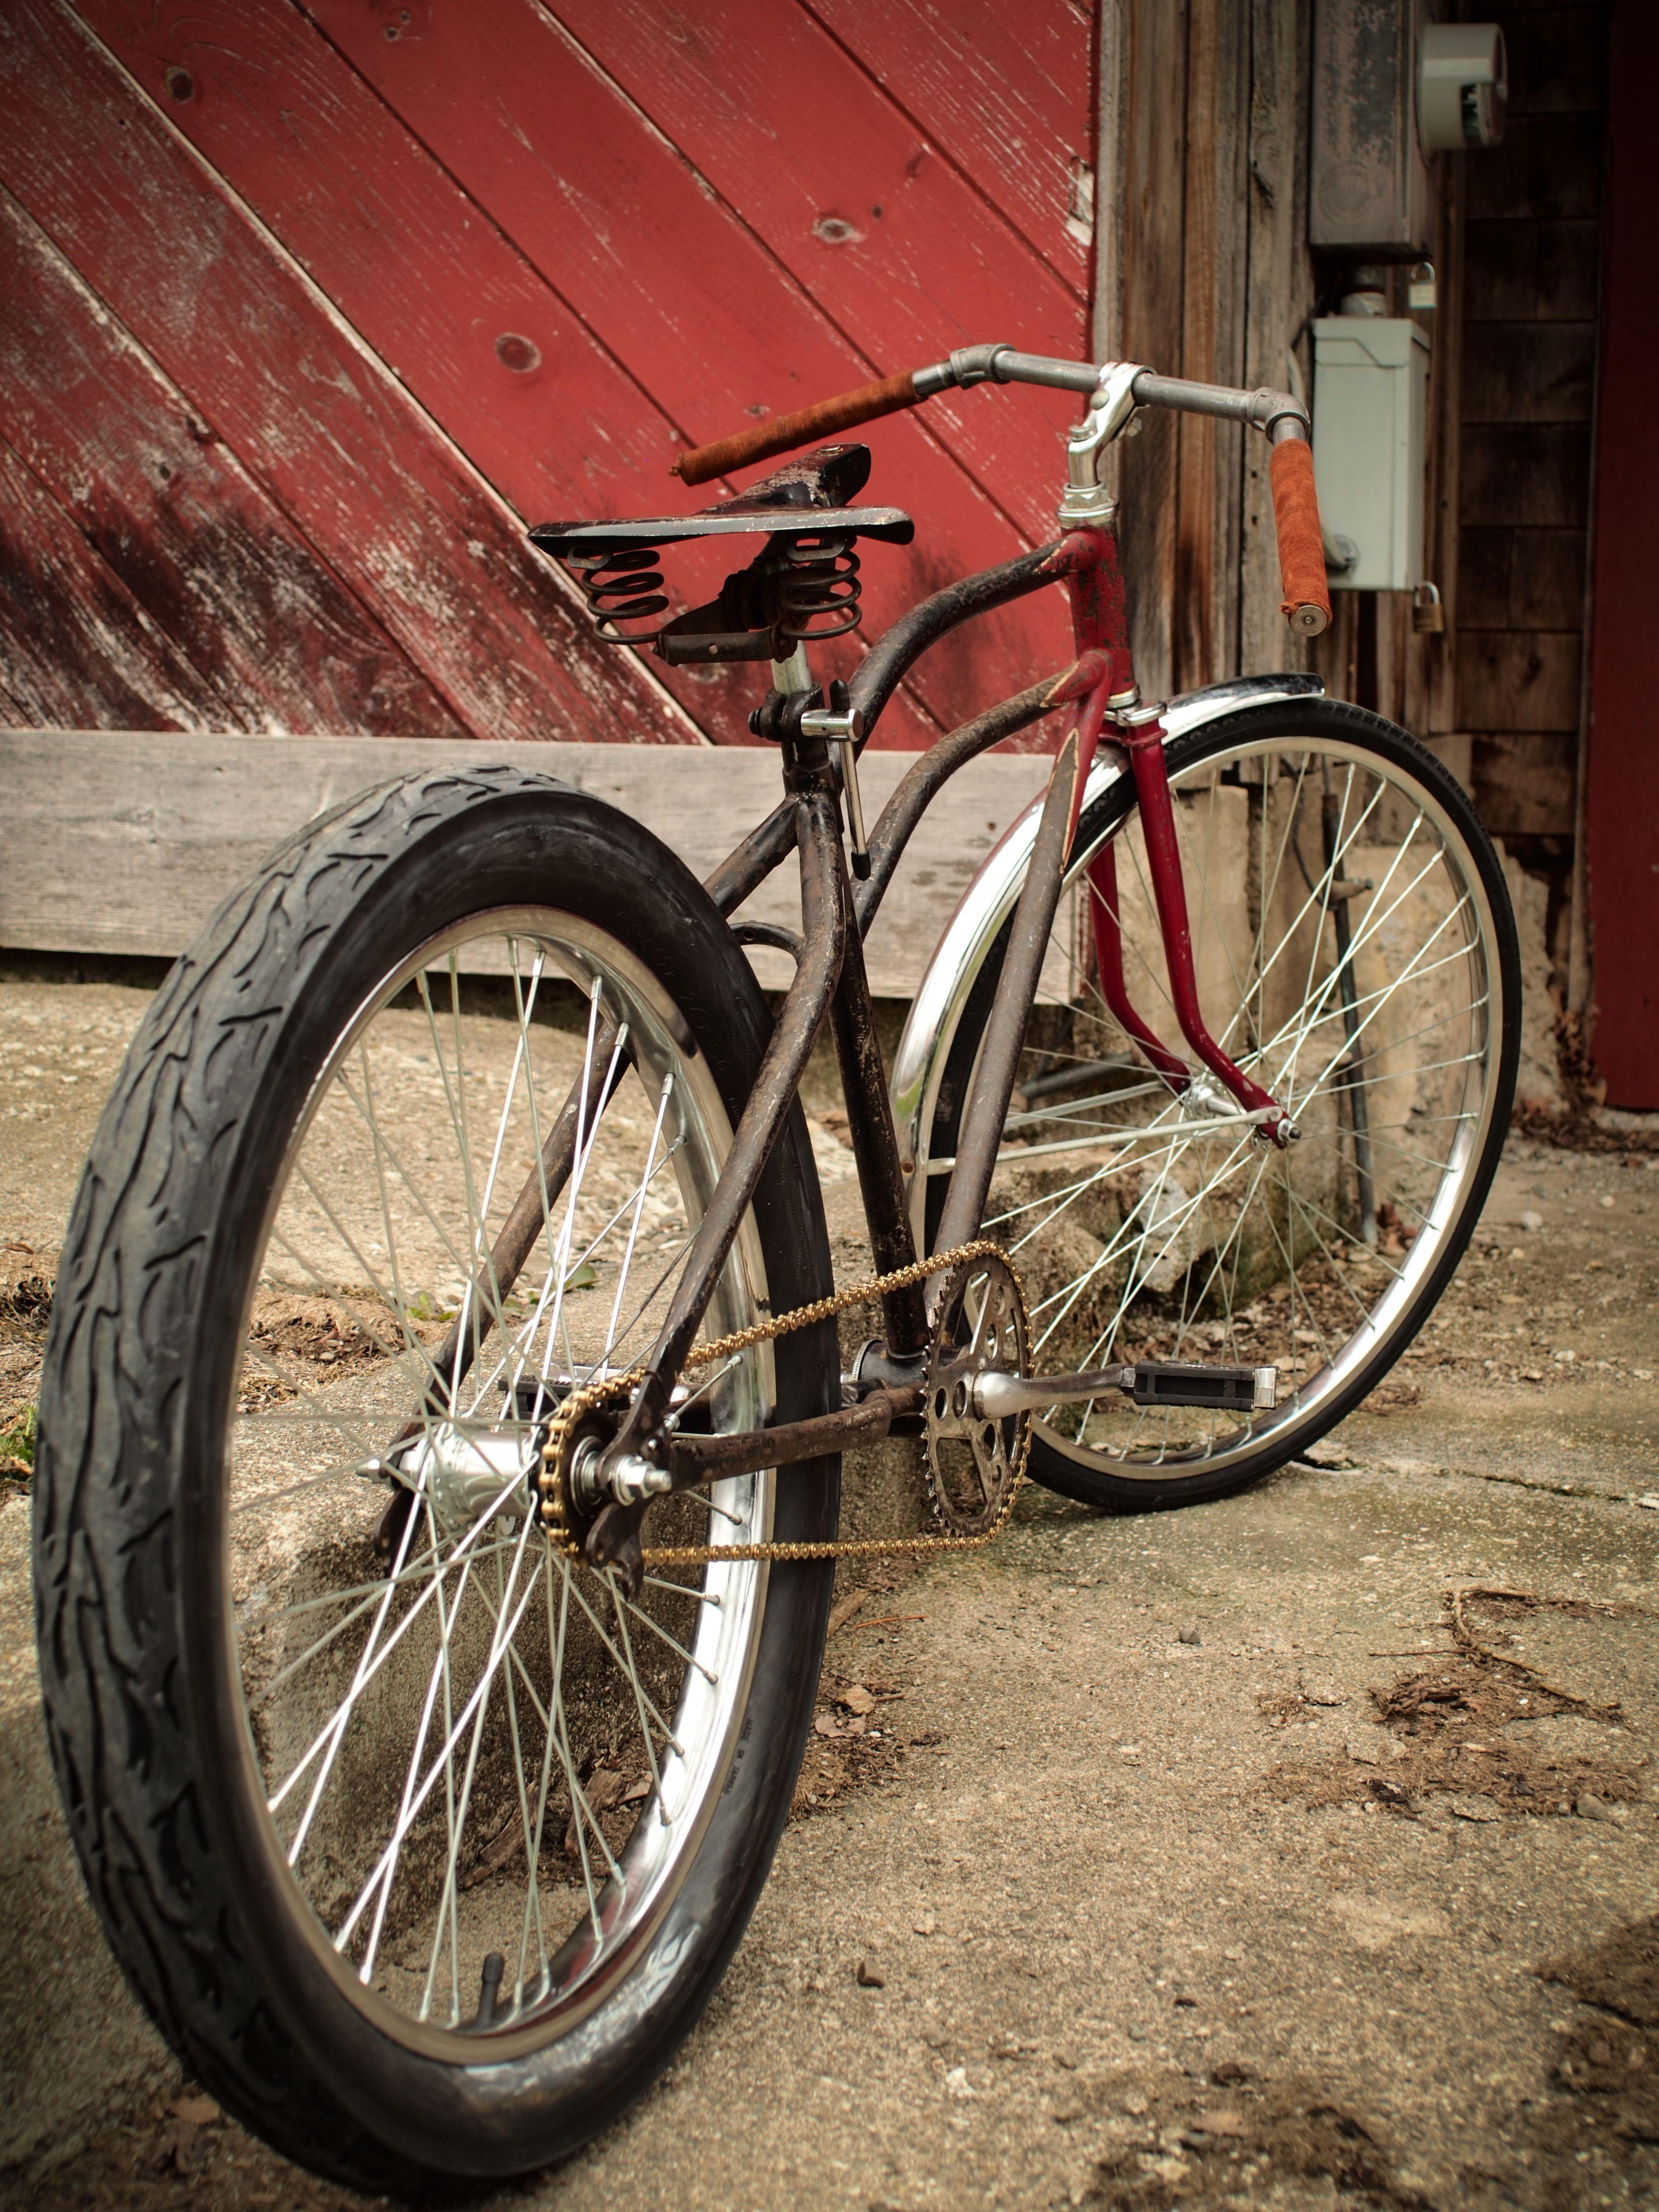 .REBEL-ROUSER RAT-ROD//2015. My Rat-Rod bike made from ...